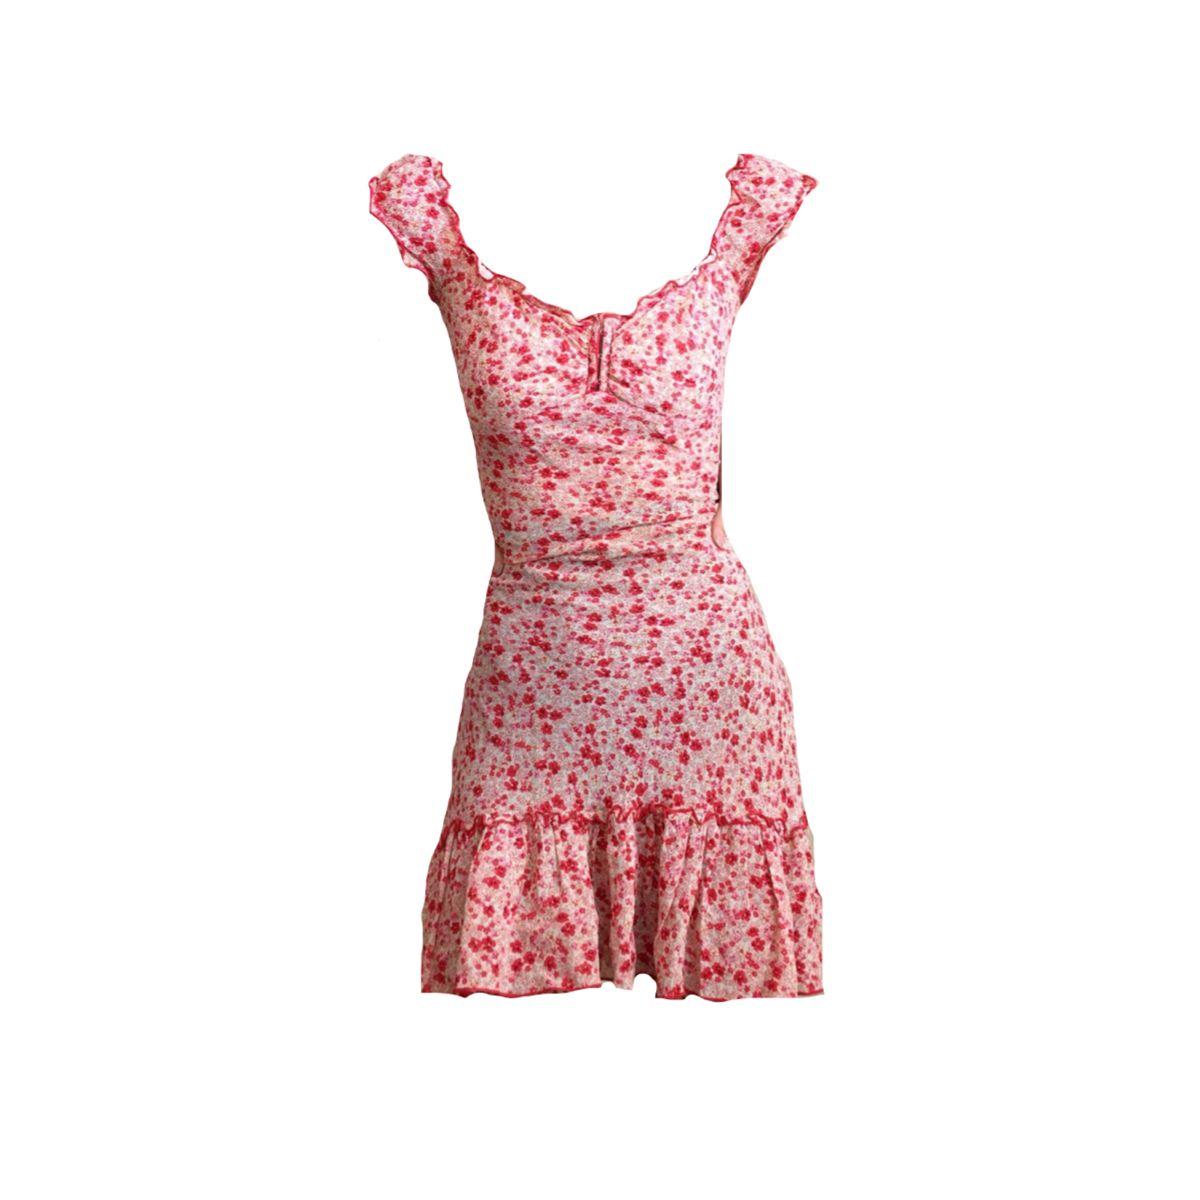 Png Polyvore Pngpolyvore Red Pink Floral Dress Png Polyvore Dress Png Outfits Dresses